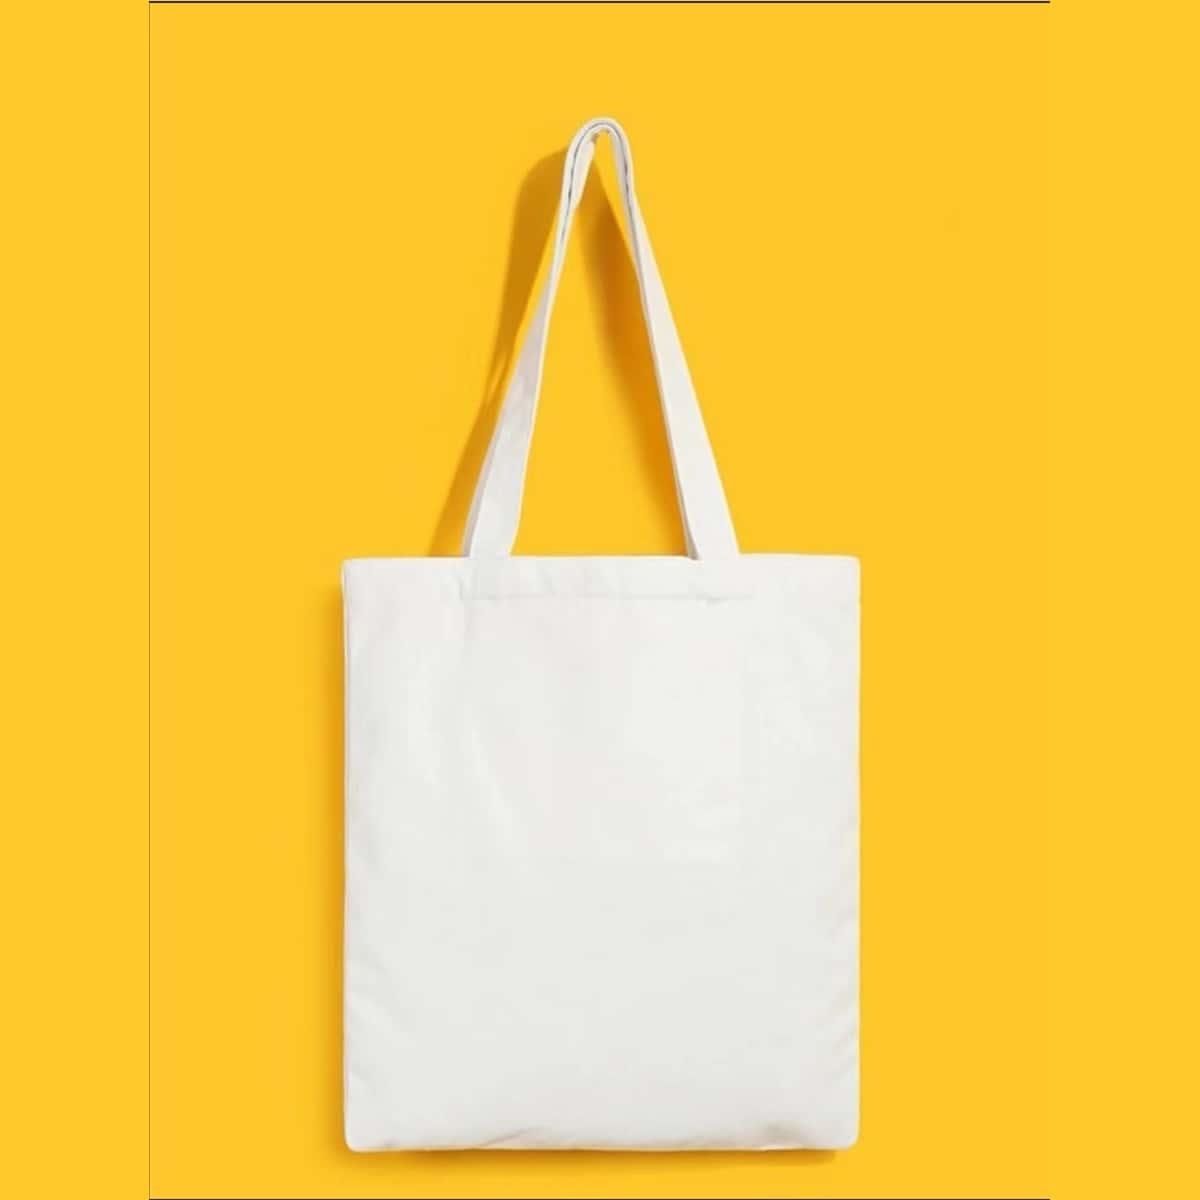 Минималистская сумка-тоут